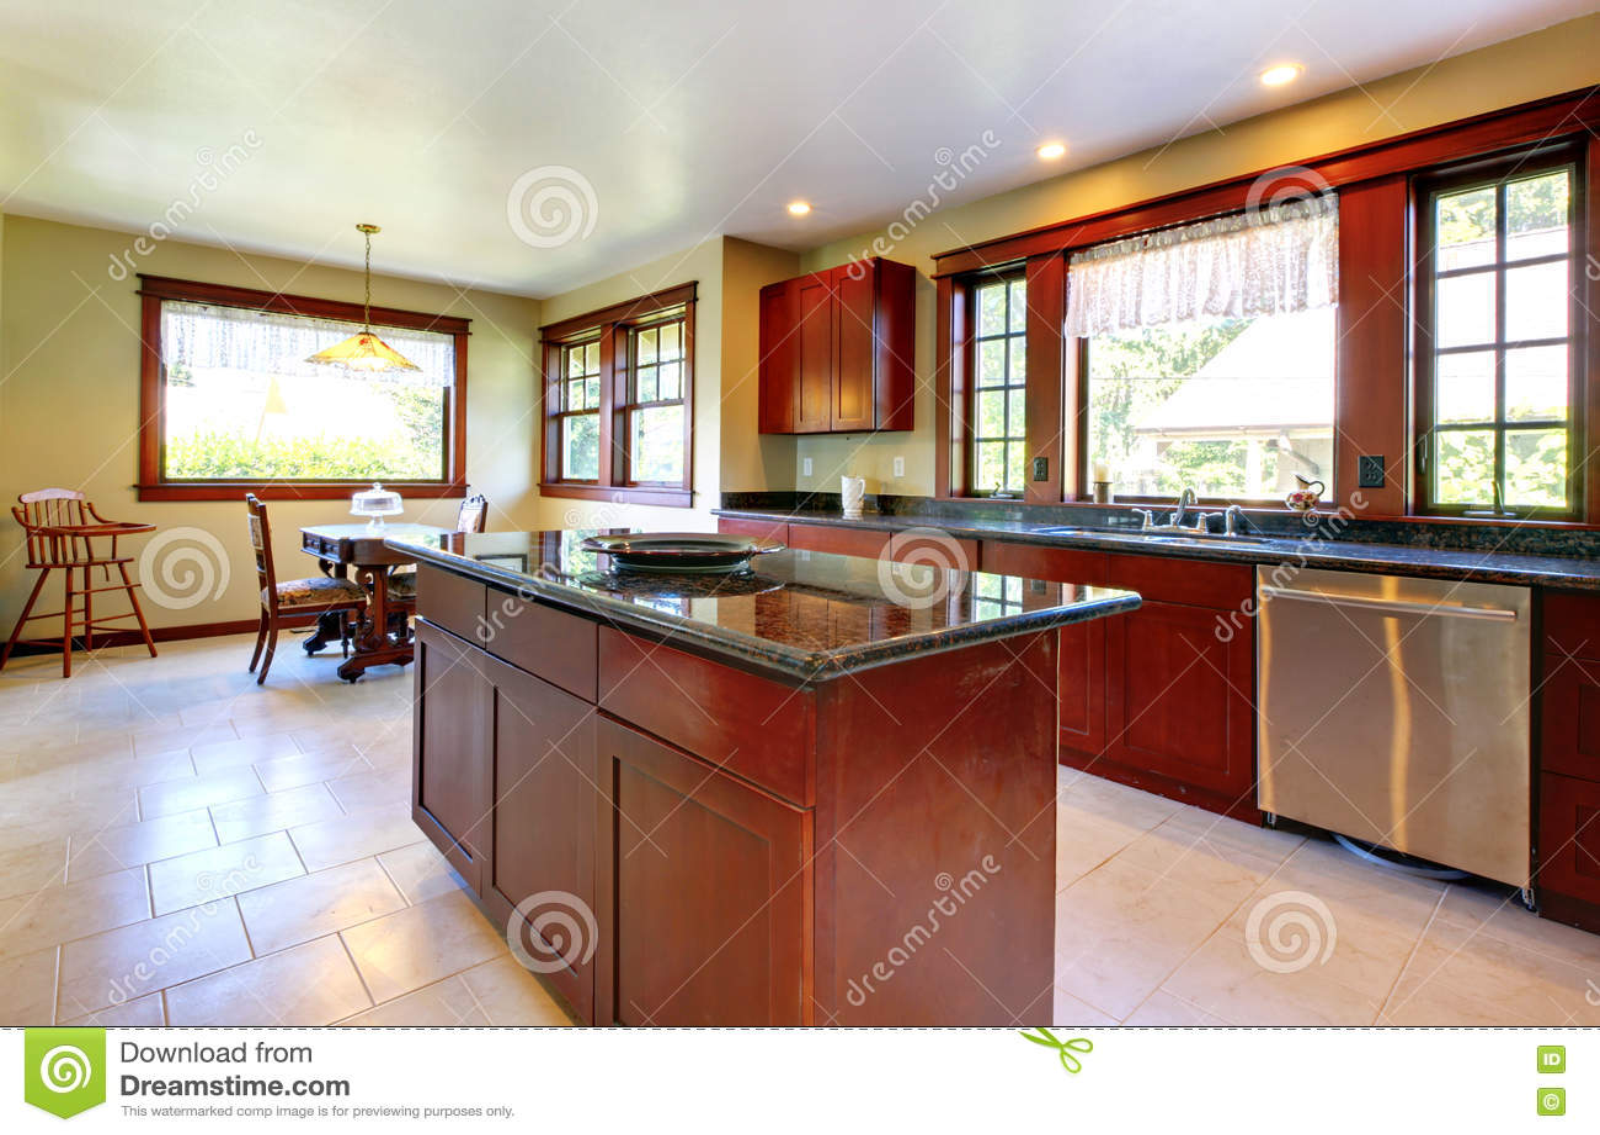 Ikea kast planner - Keuken met teller ...